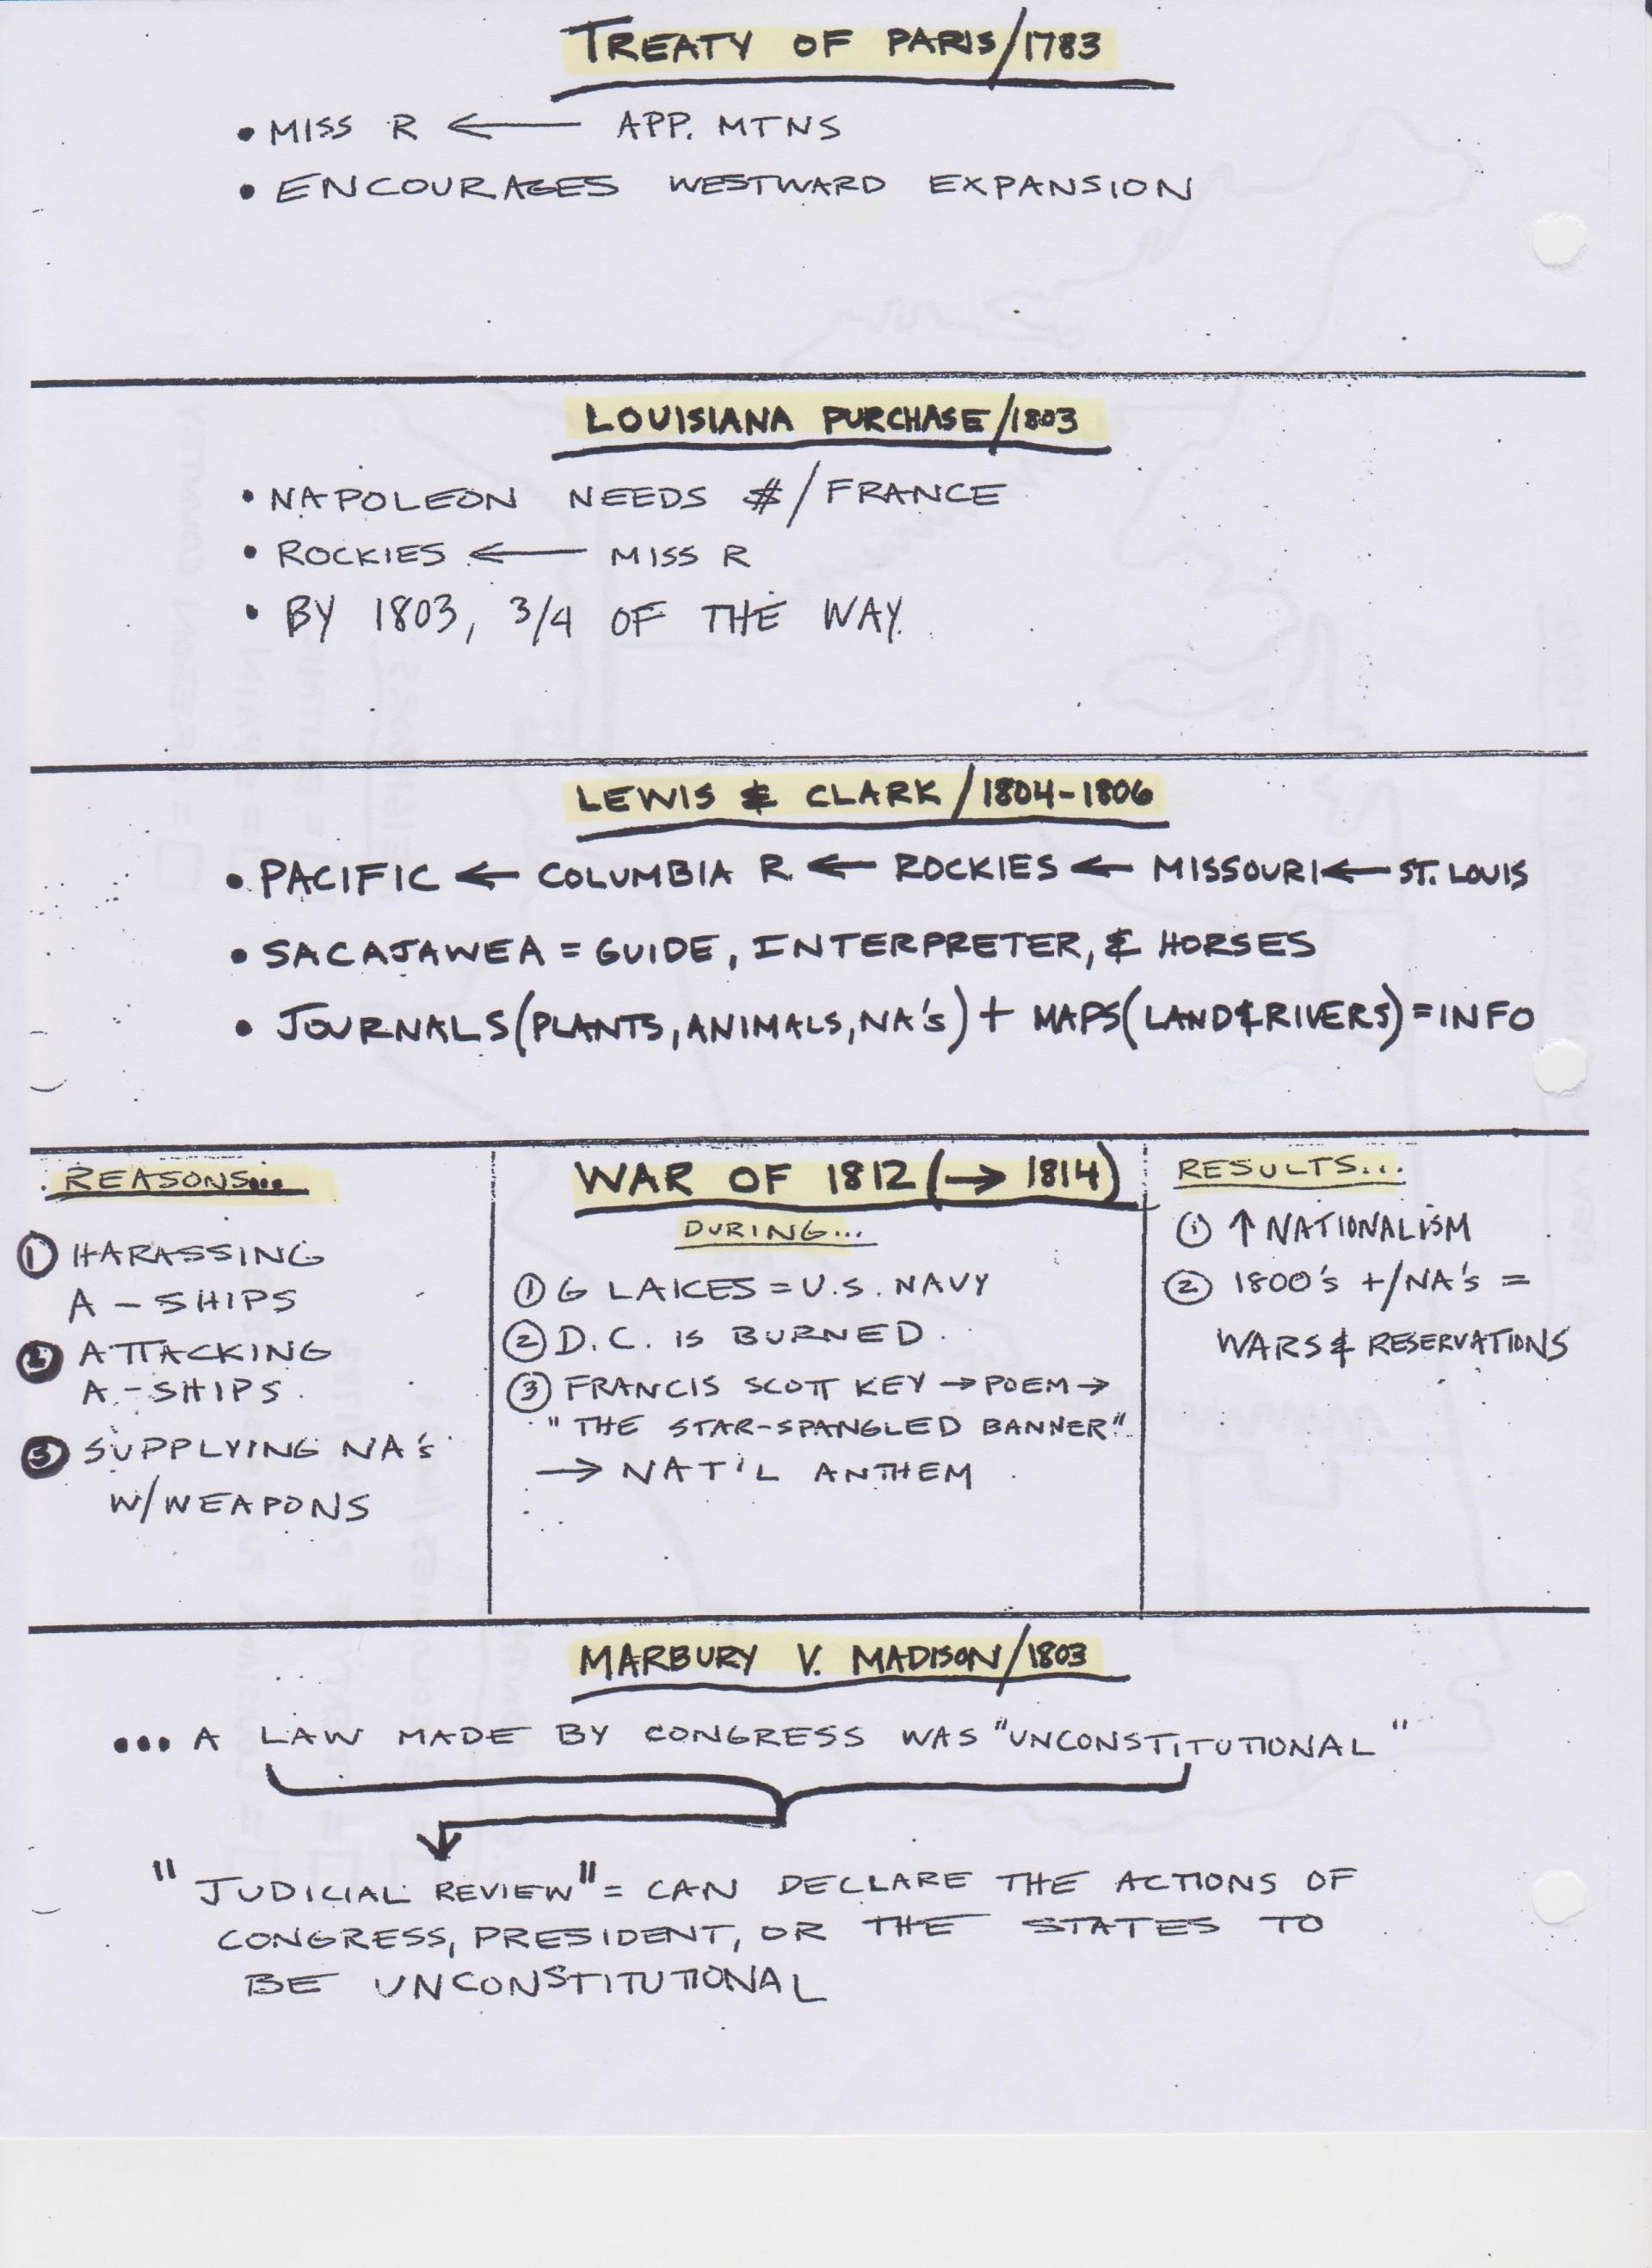 002 Manifest Destiny Essay Ch20920notes20pg202202016 Impressive Prompt Outline Introduction 1920